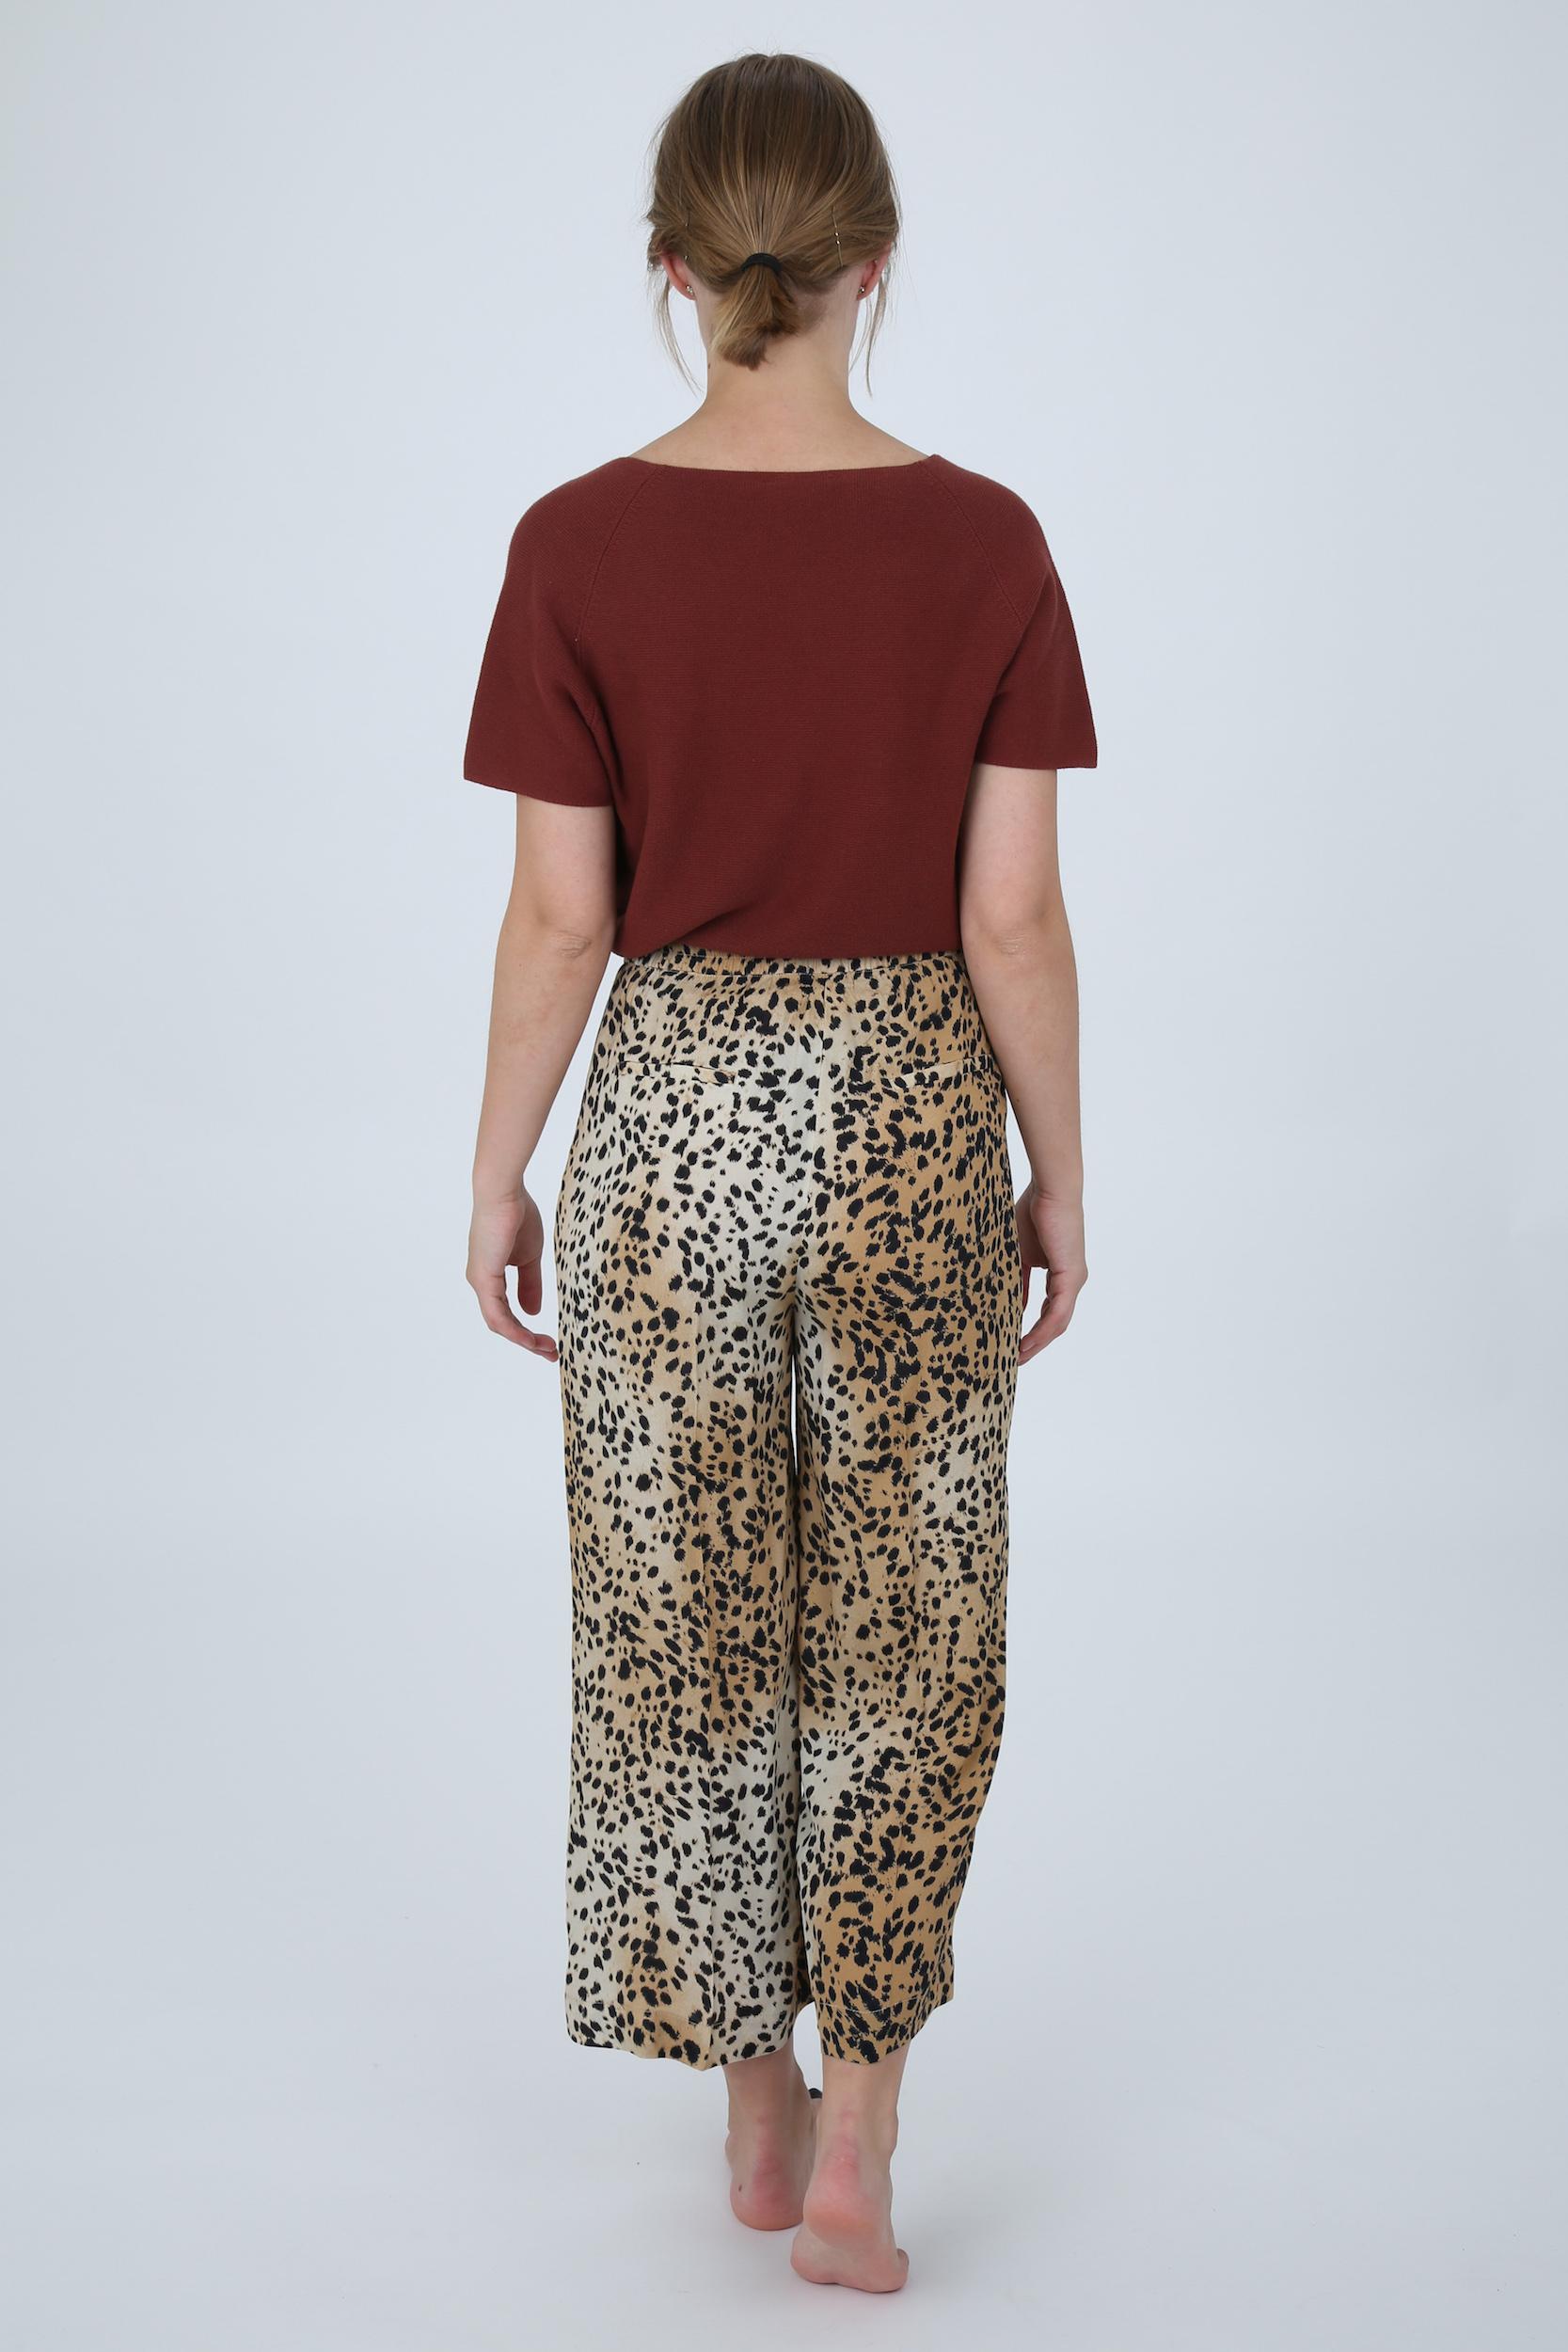 Culotte mit Gepardenprint